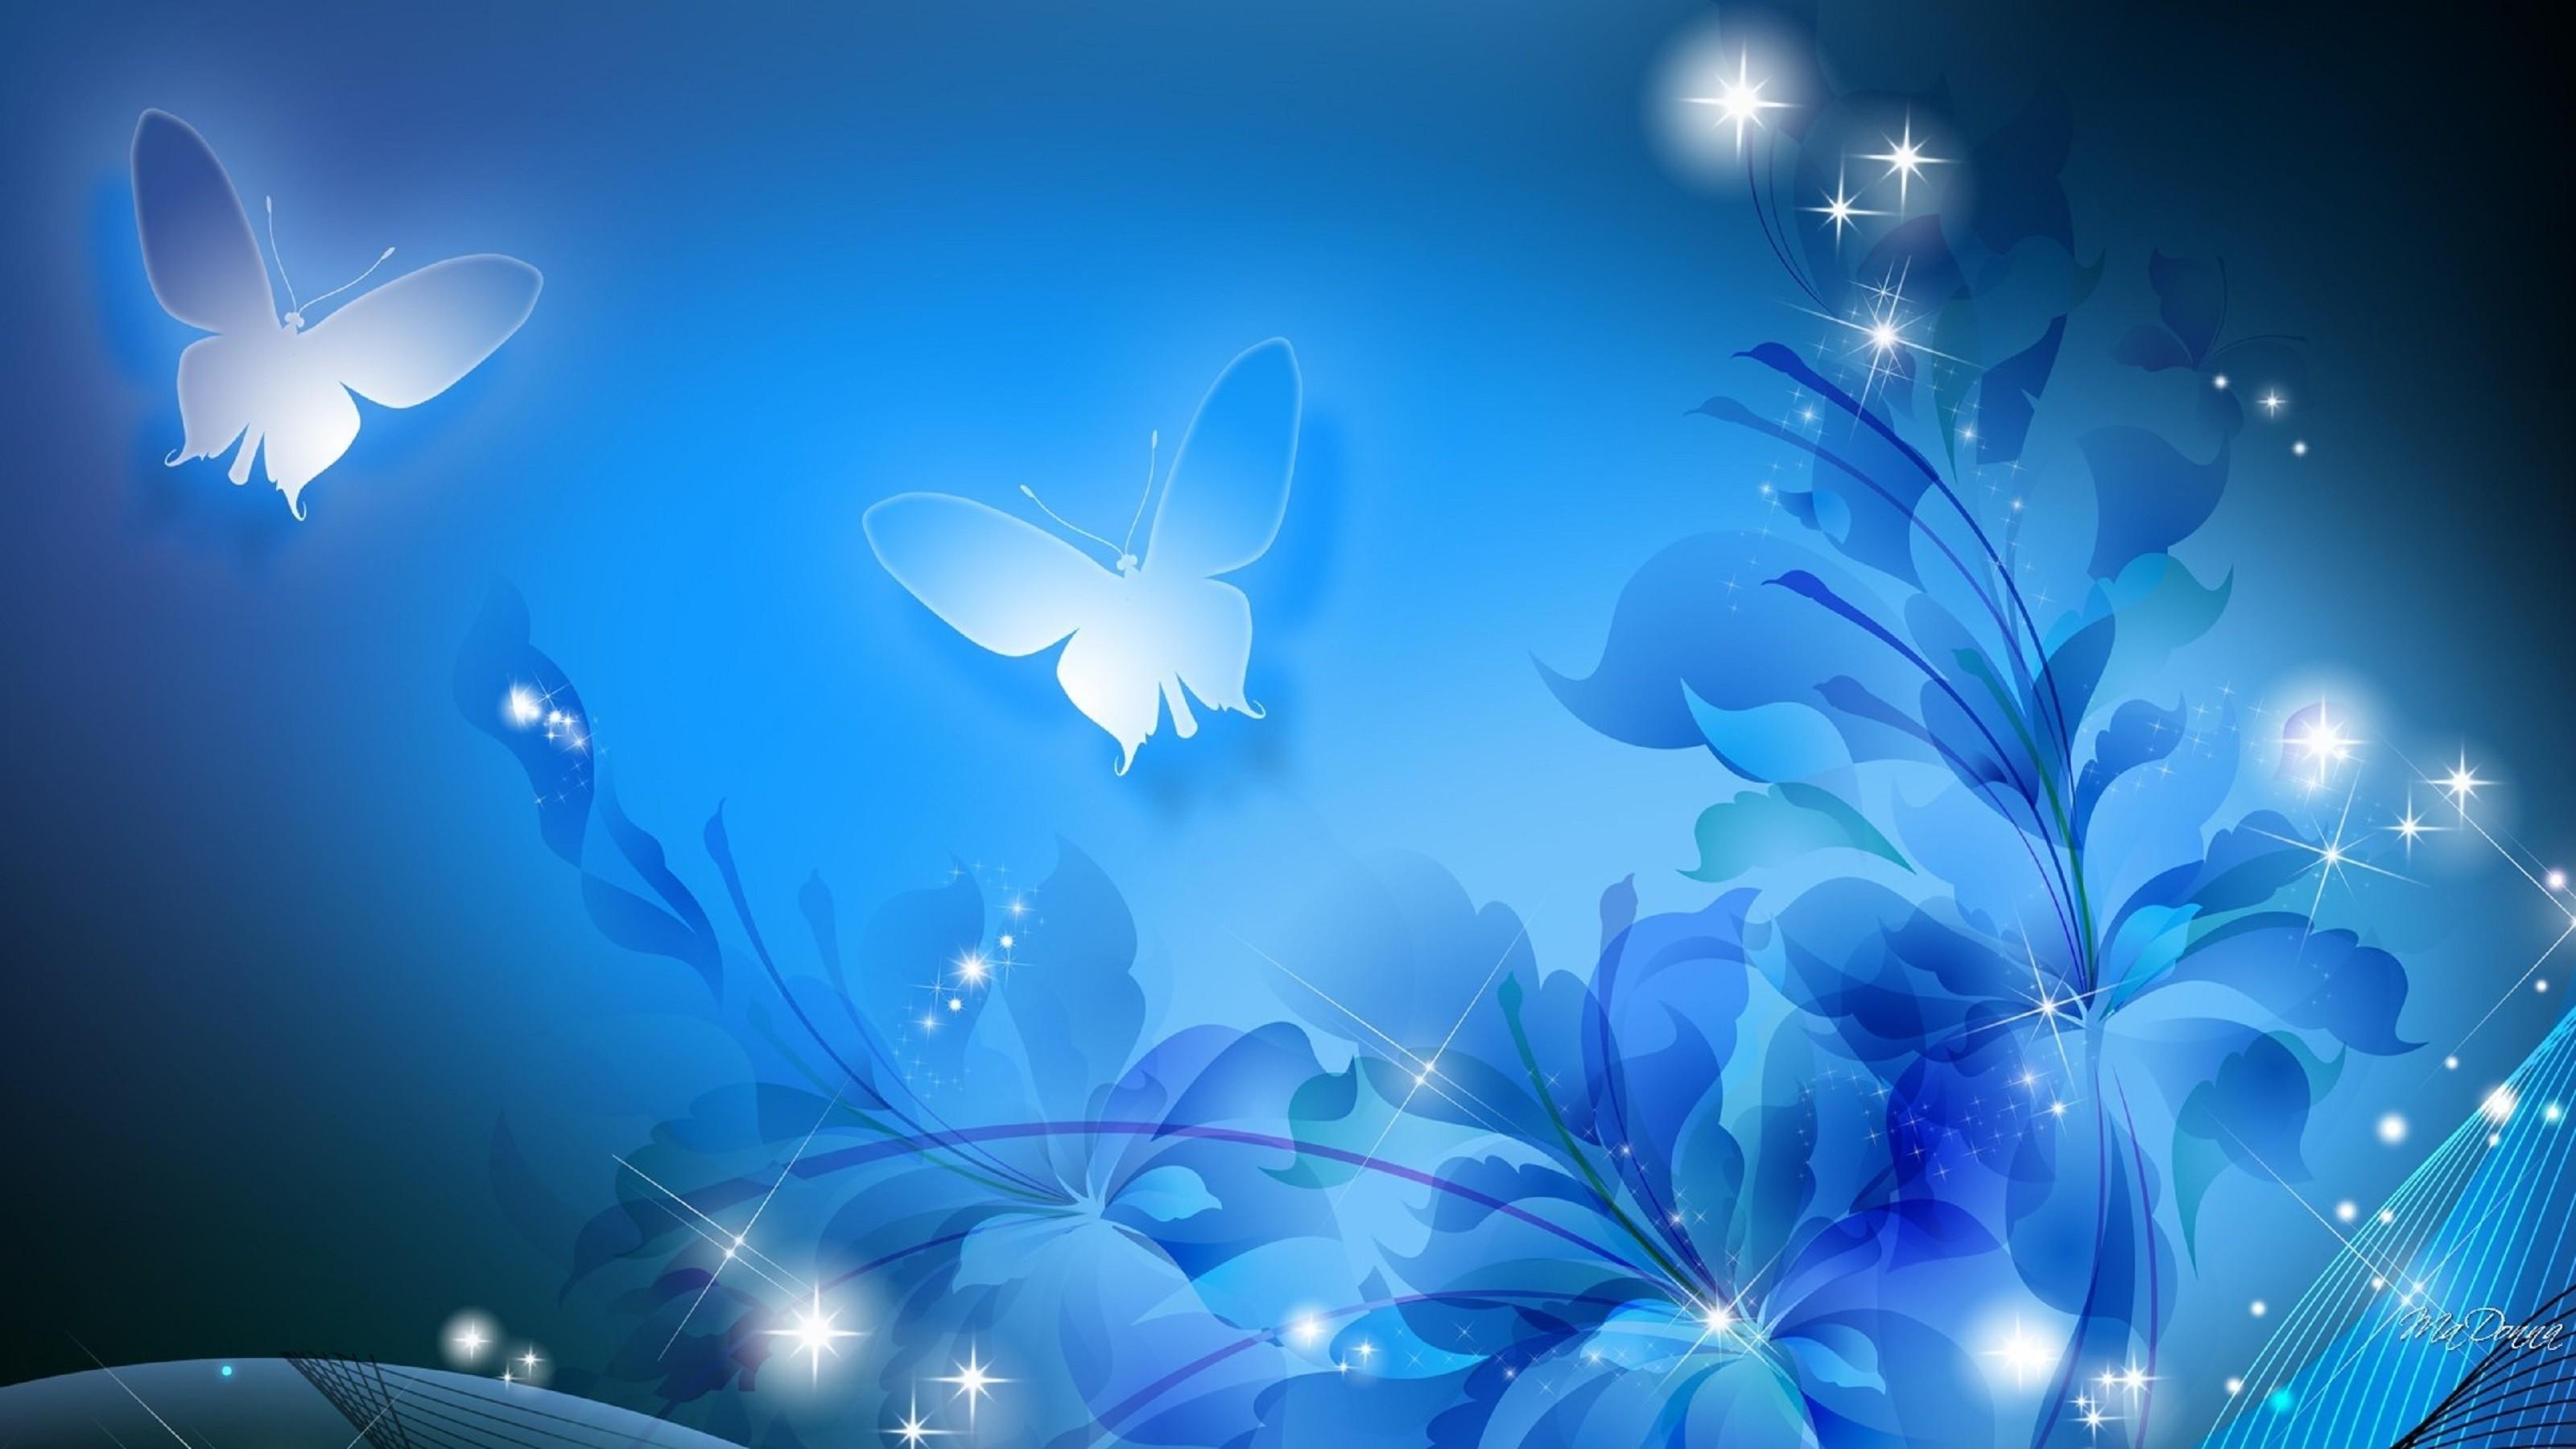 Light Blue Flowers HD Desktop Background 1